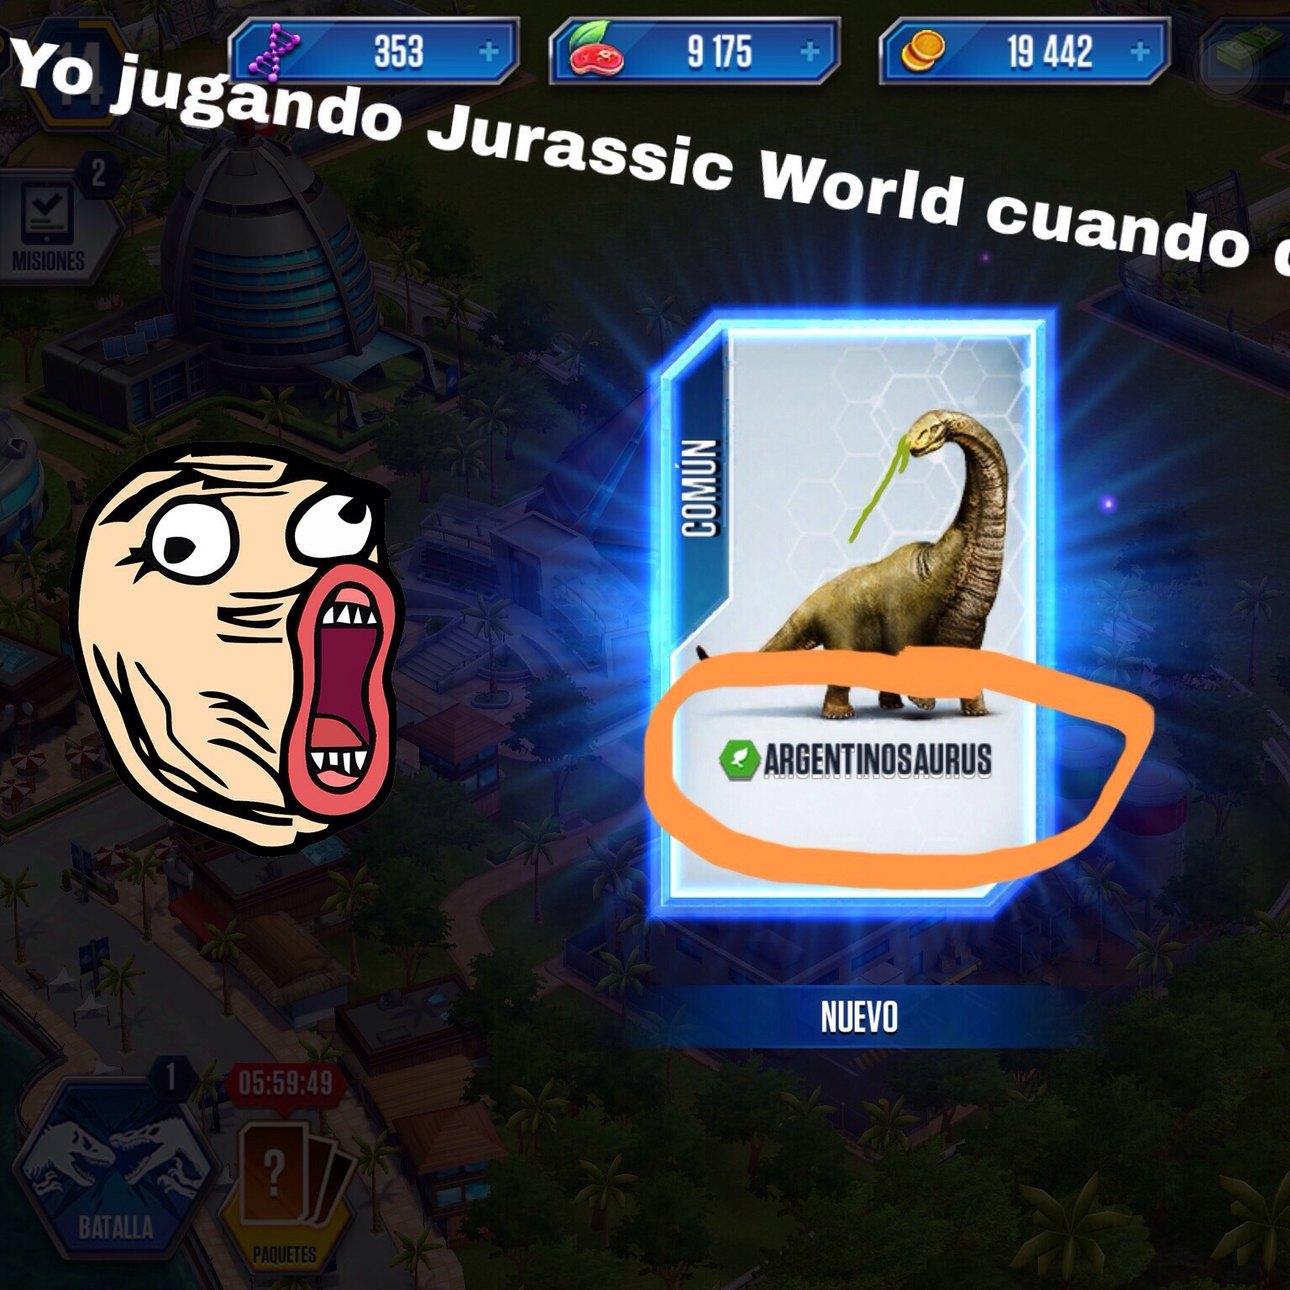 Argentinos - meme